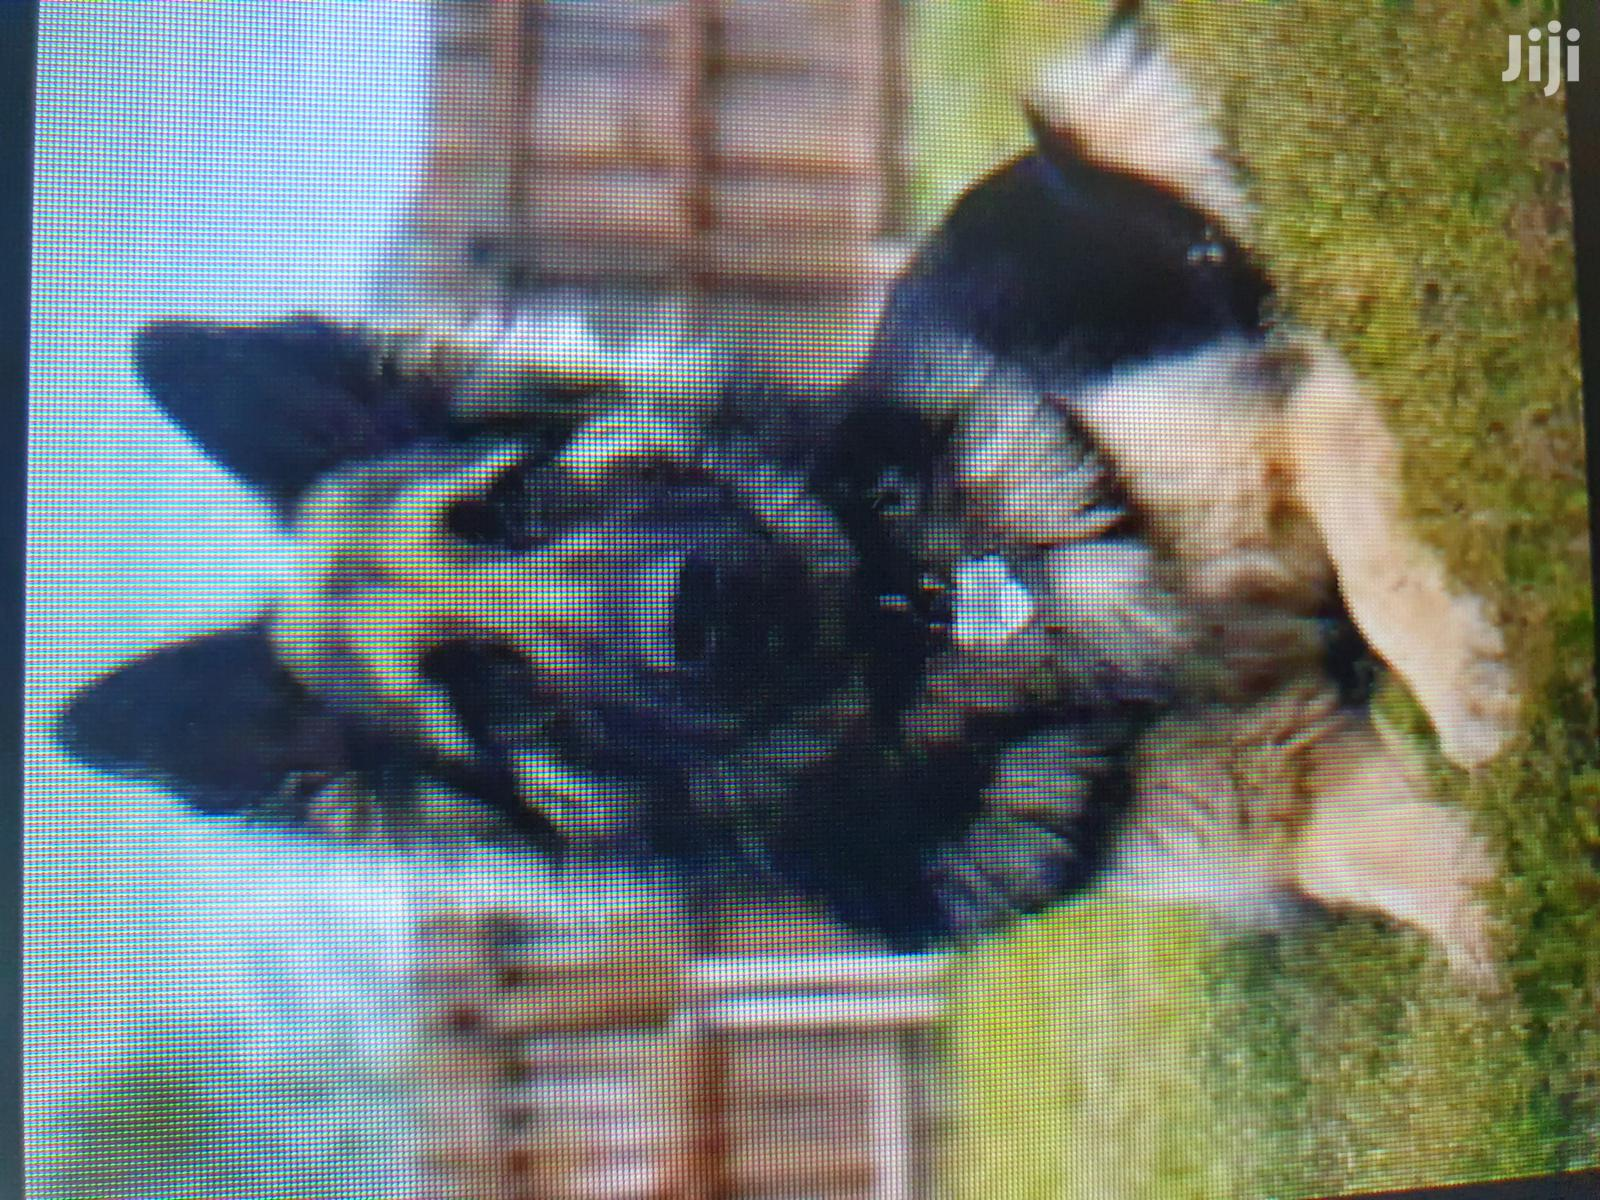 6-12 Month Male Purebred German Shepherd